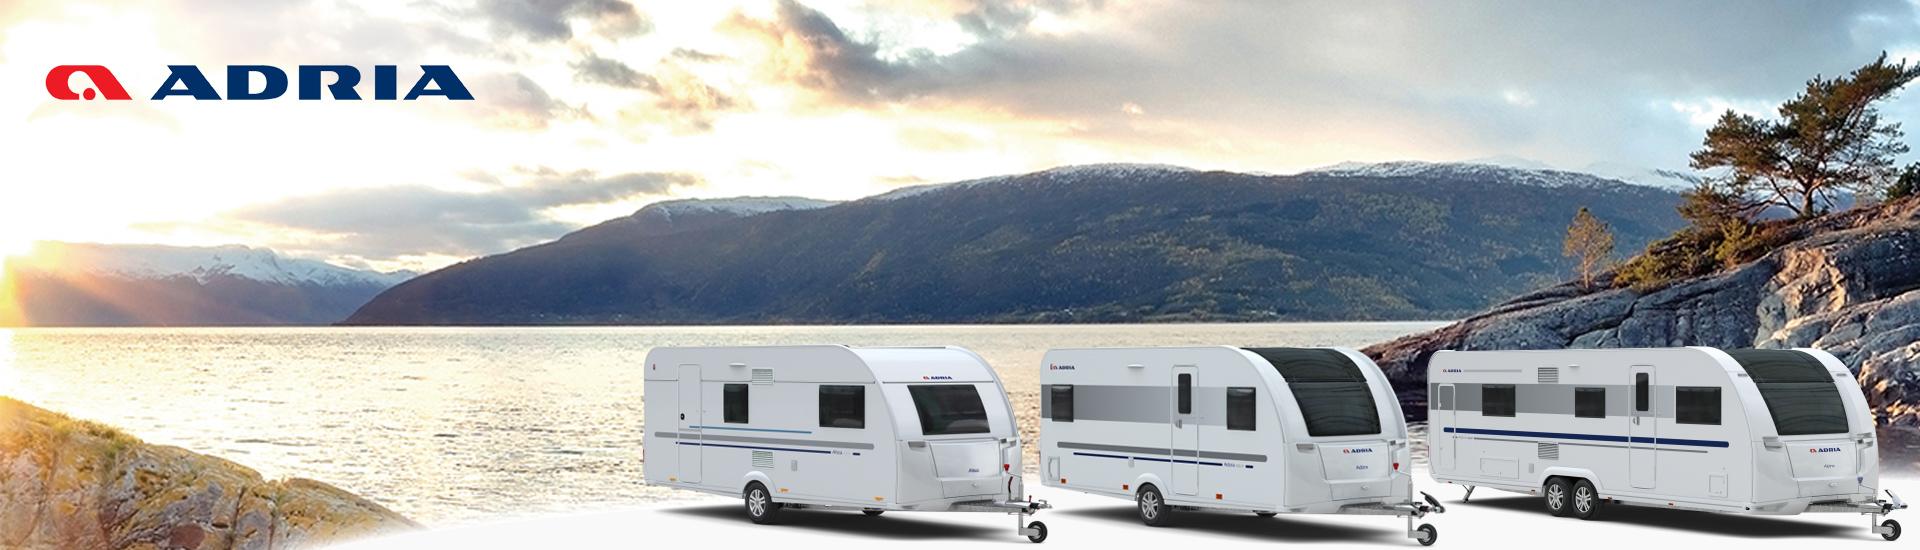 Teesside Adria Caravans